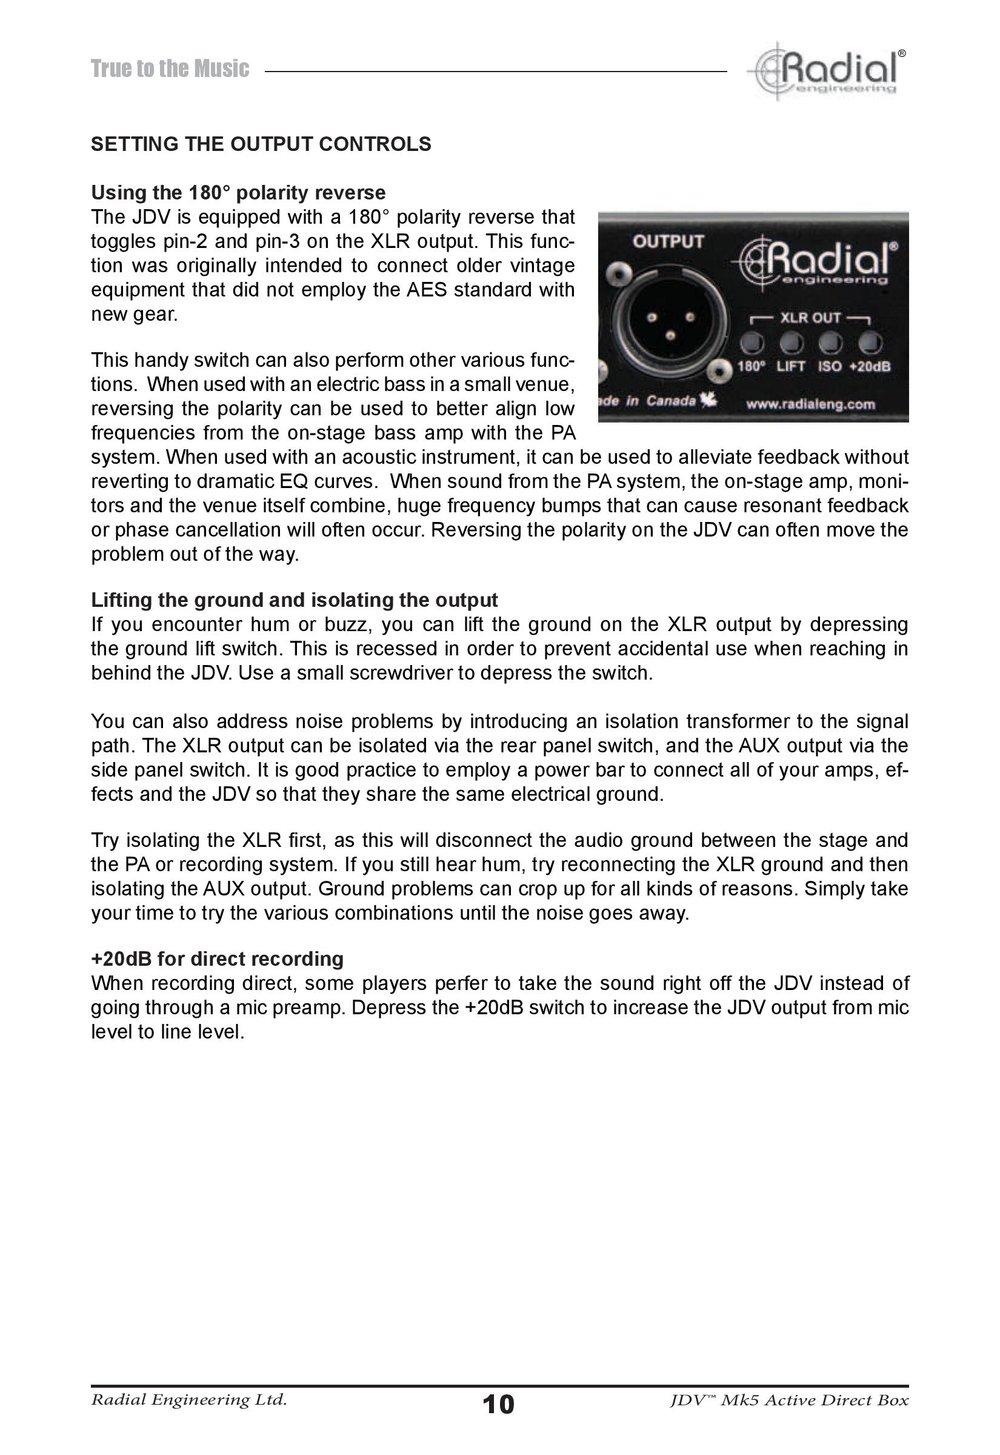 jdv-mk5-userguide-web-page-012.jpg